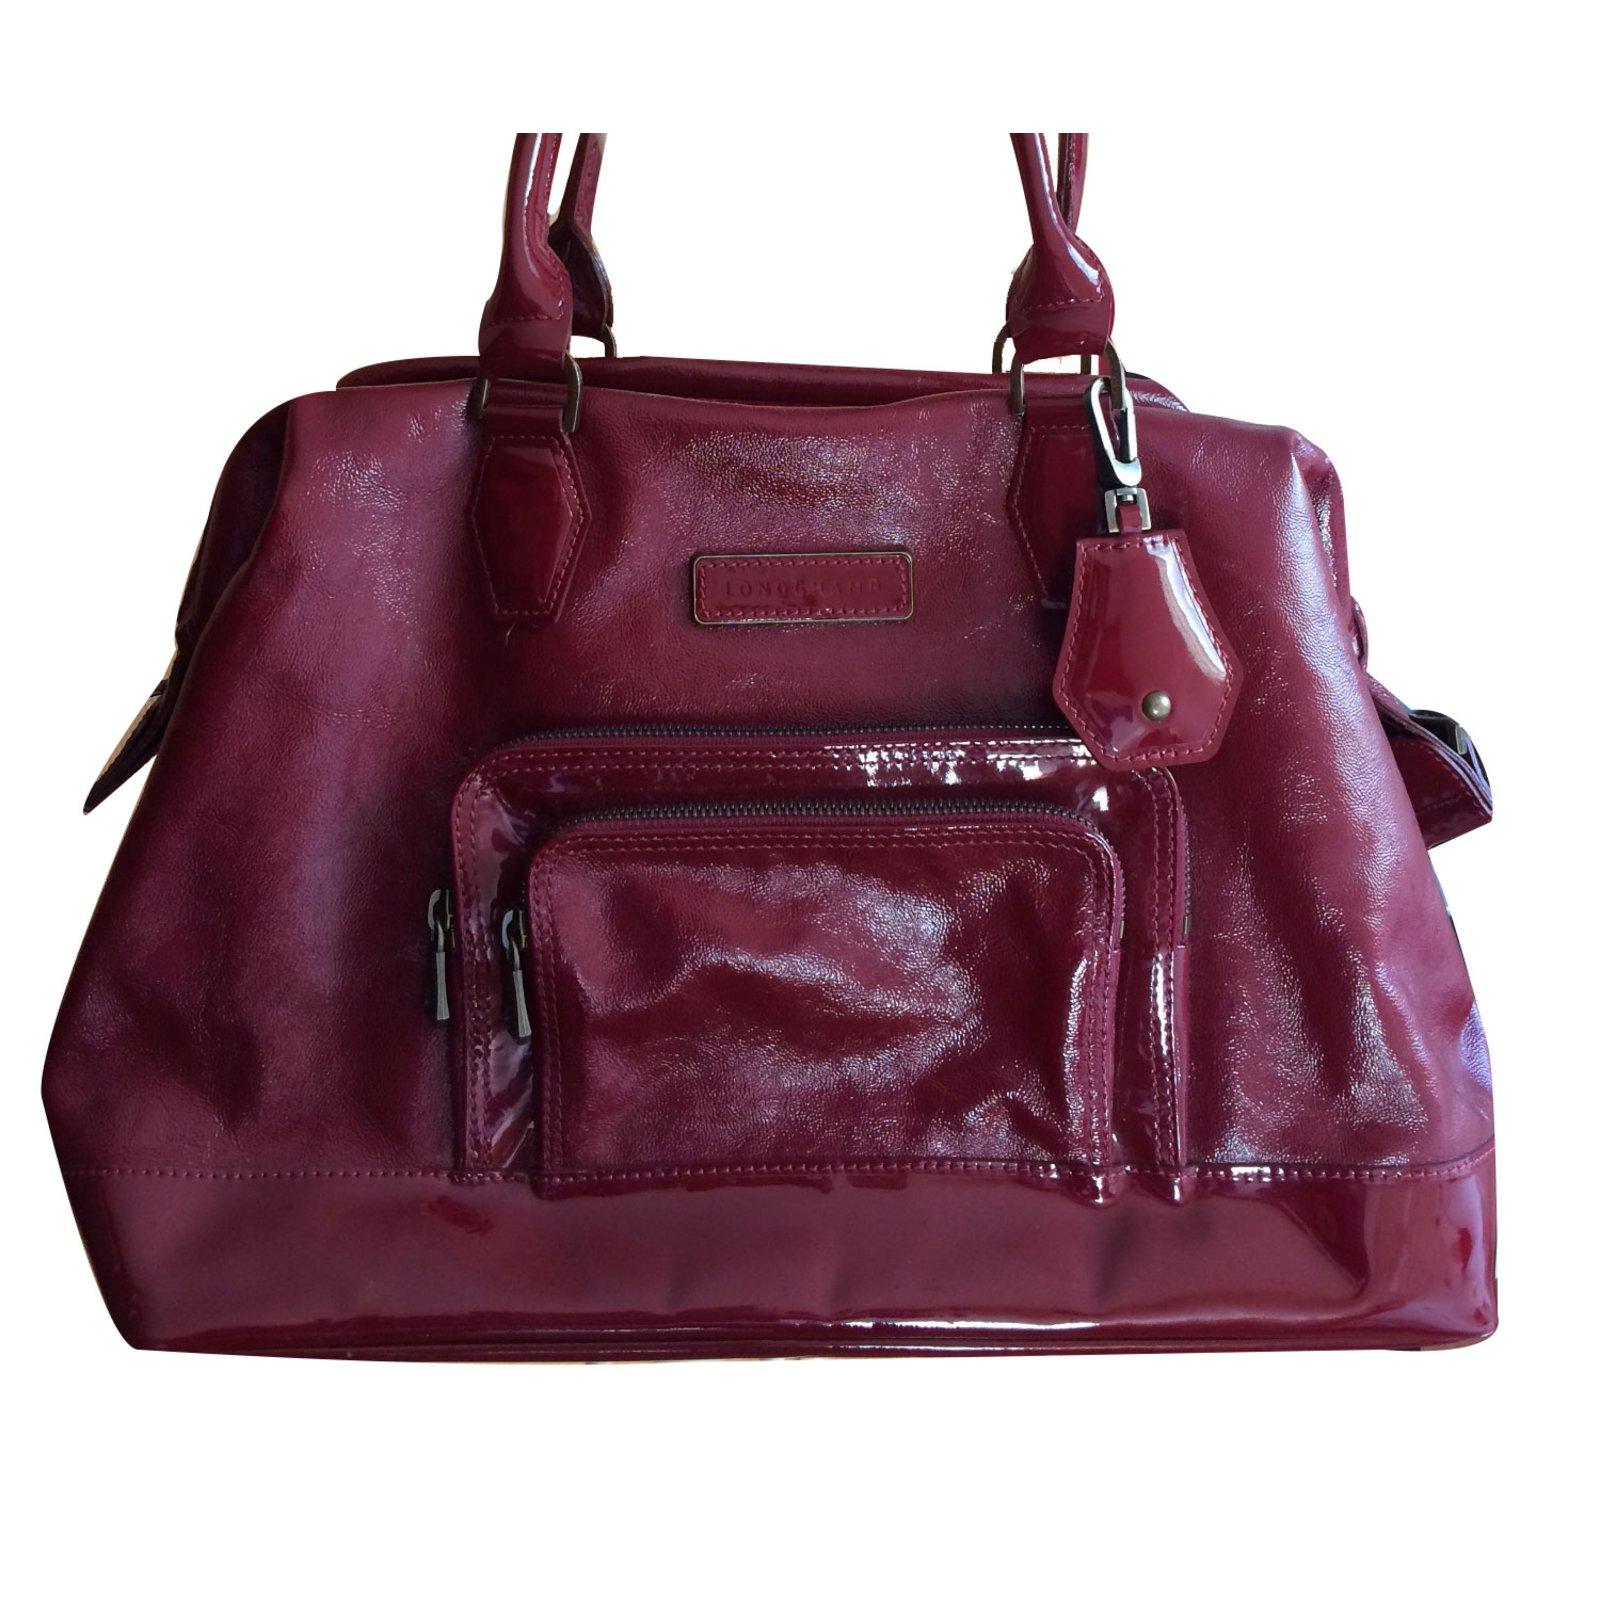 sac a main cuir longchamp - Sac A Main Color